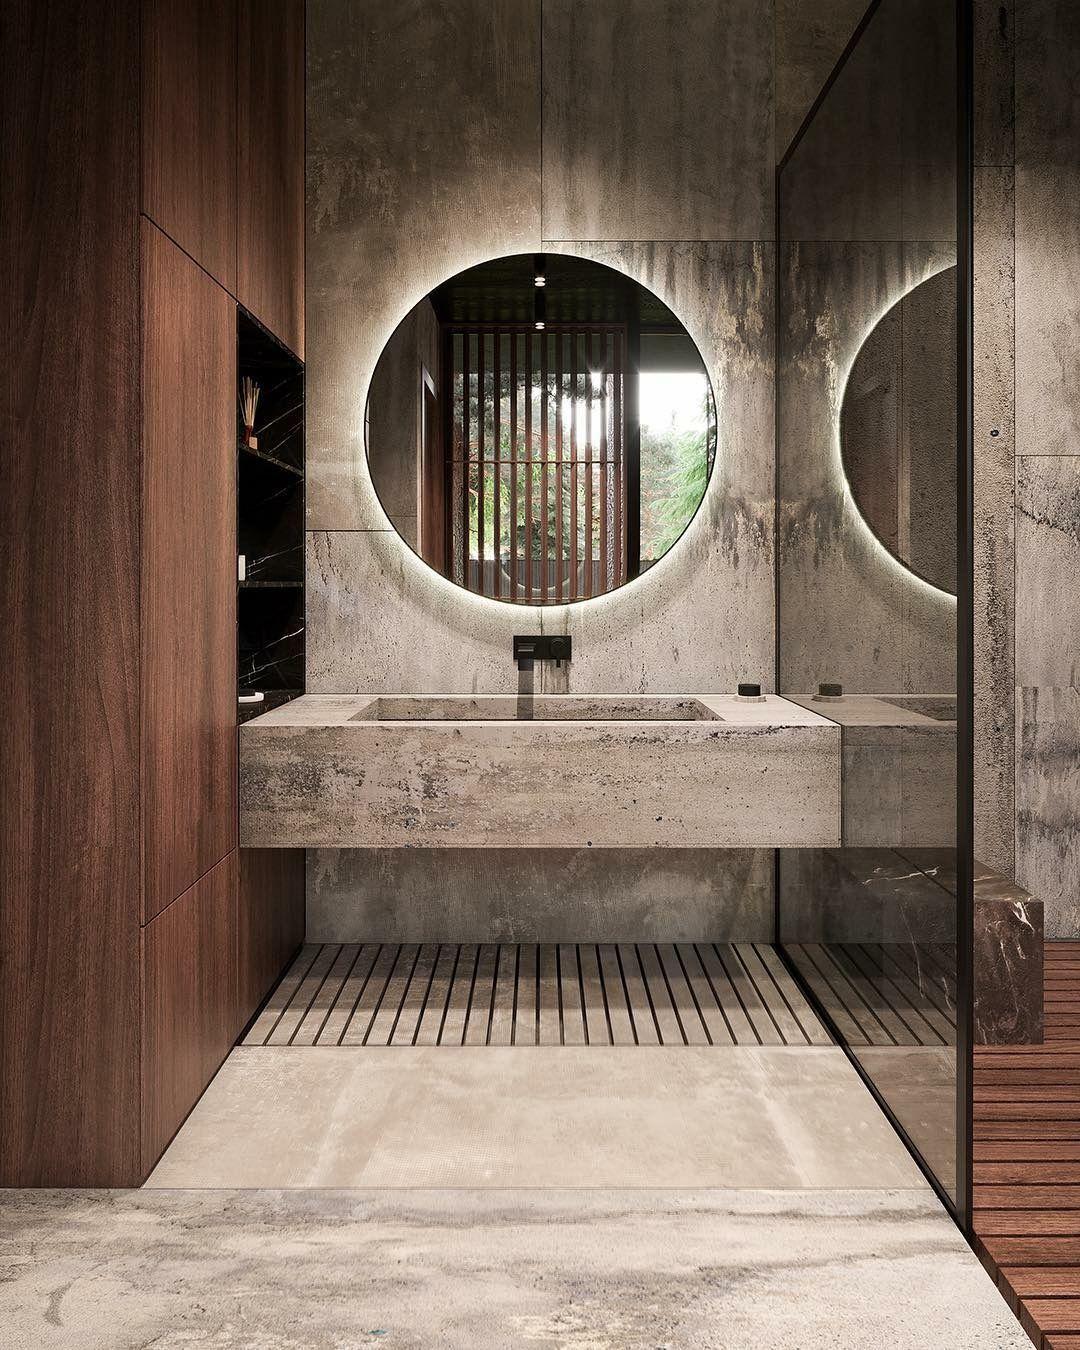 Minimalist Bathroom Pinterest: Pin By Pantelitsa Themistocleous On Bathroom. In 2019